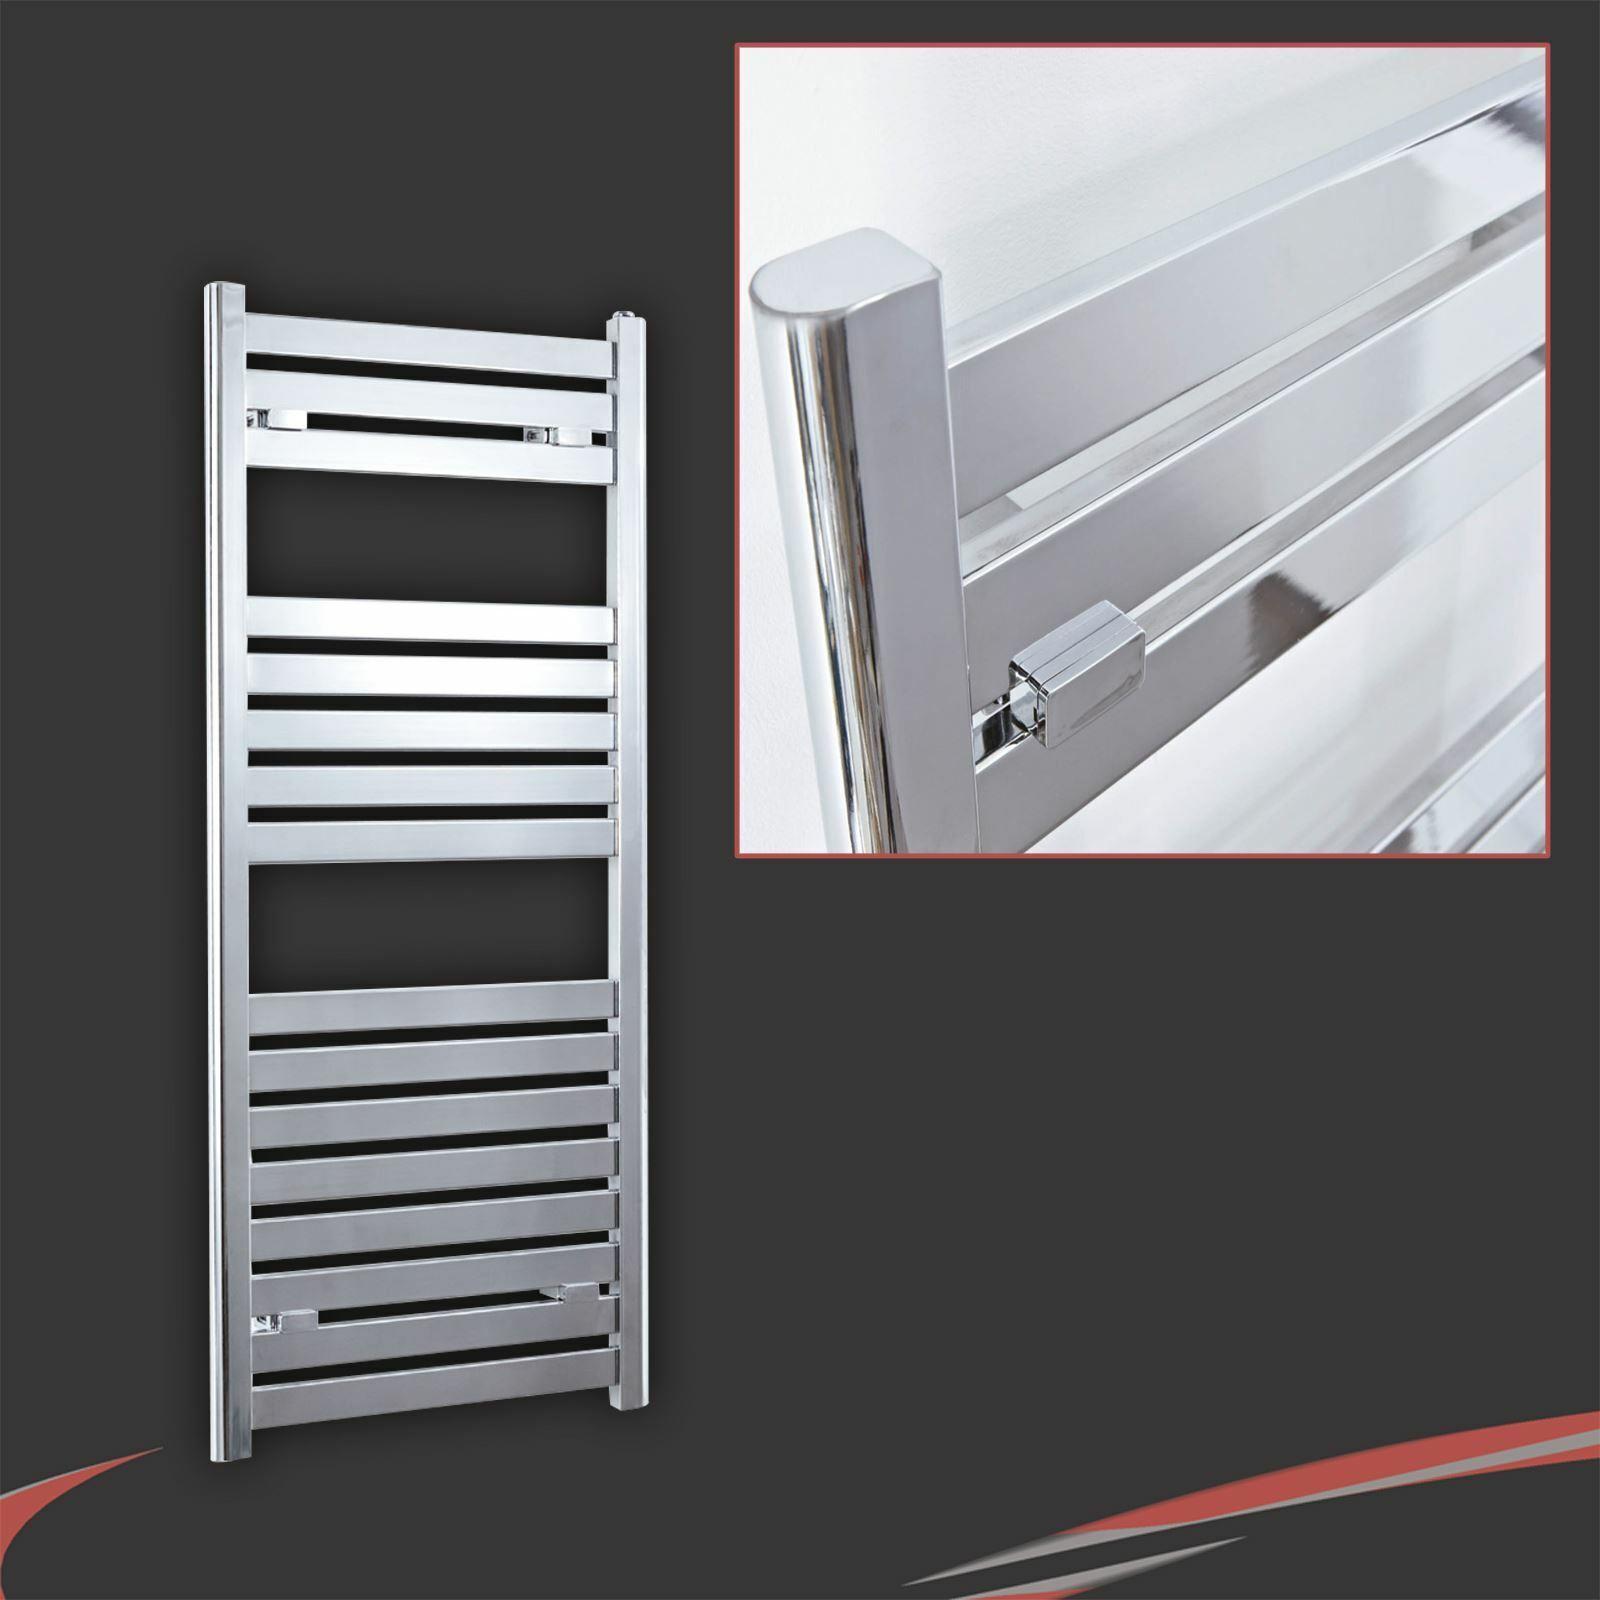 500 mm (W) x 1200 mm (H)  Espace  Chrome Designer sèche-serviettes 2604 BTU